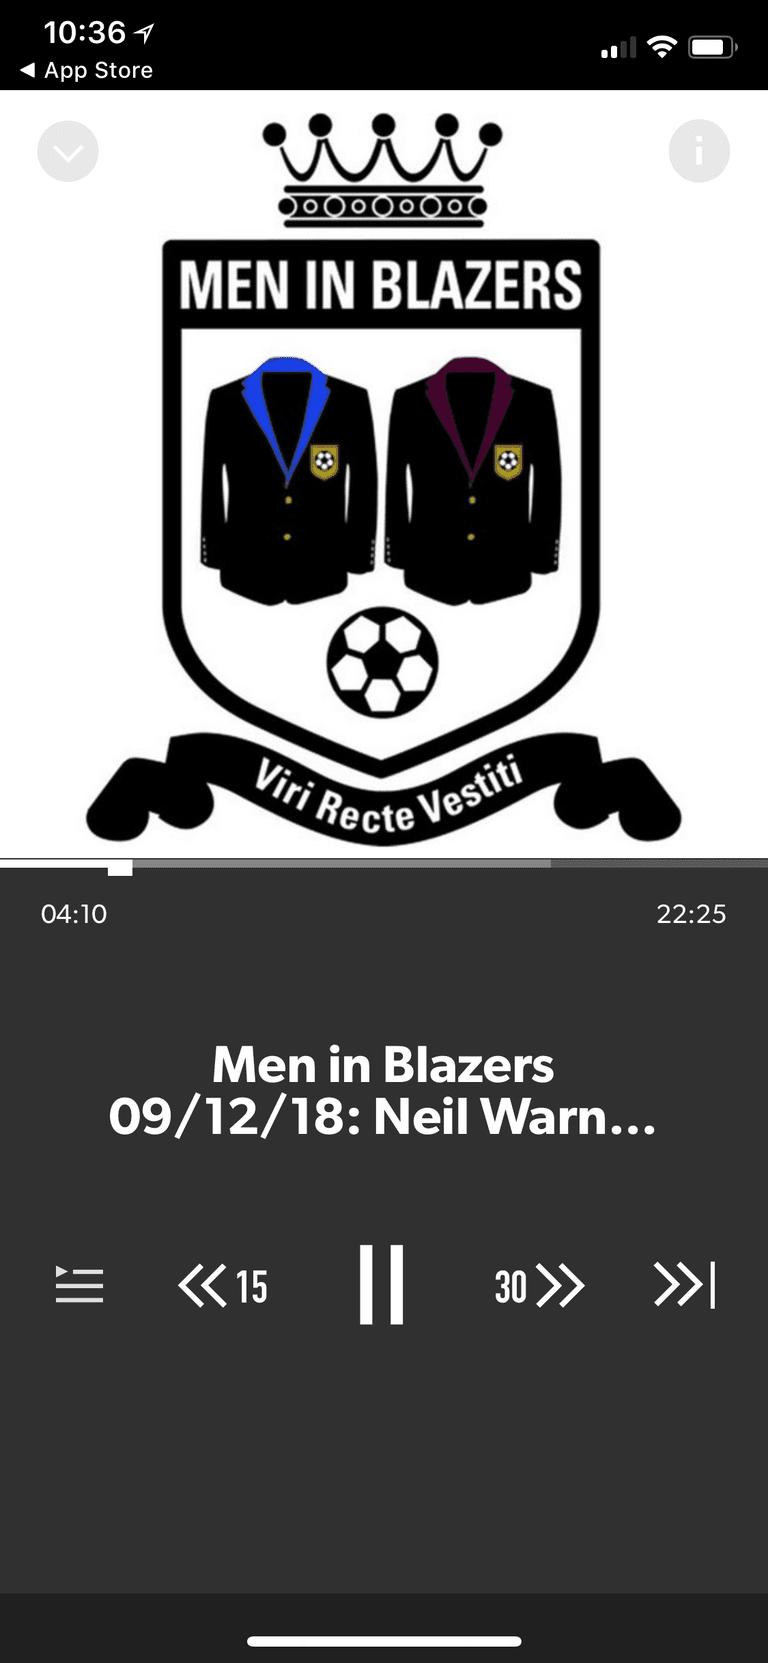 Men in Blazers podcast